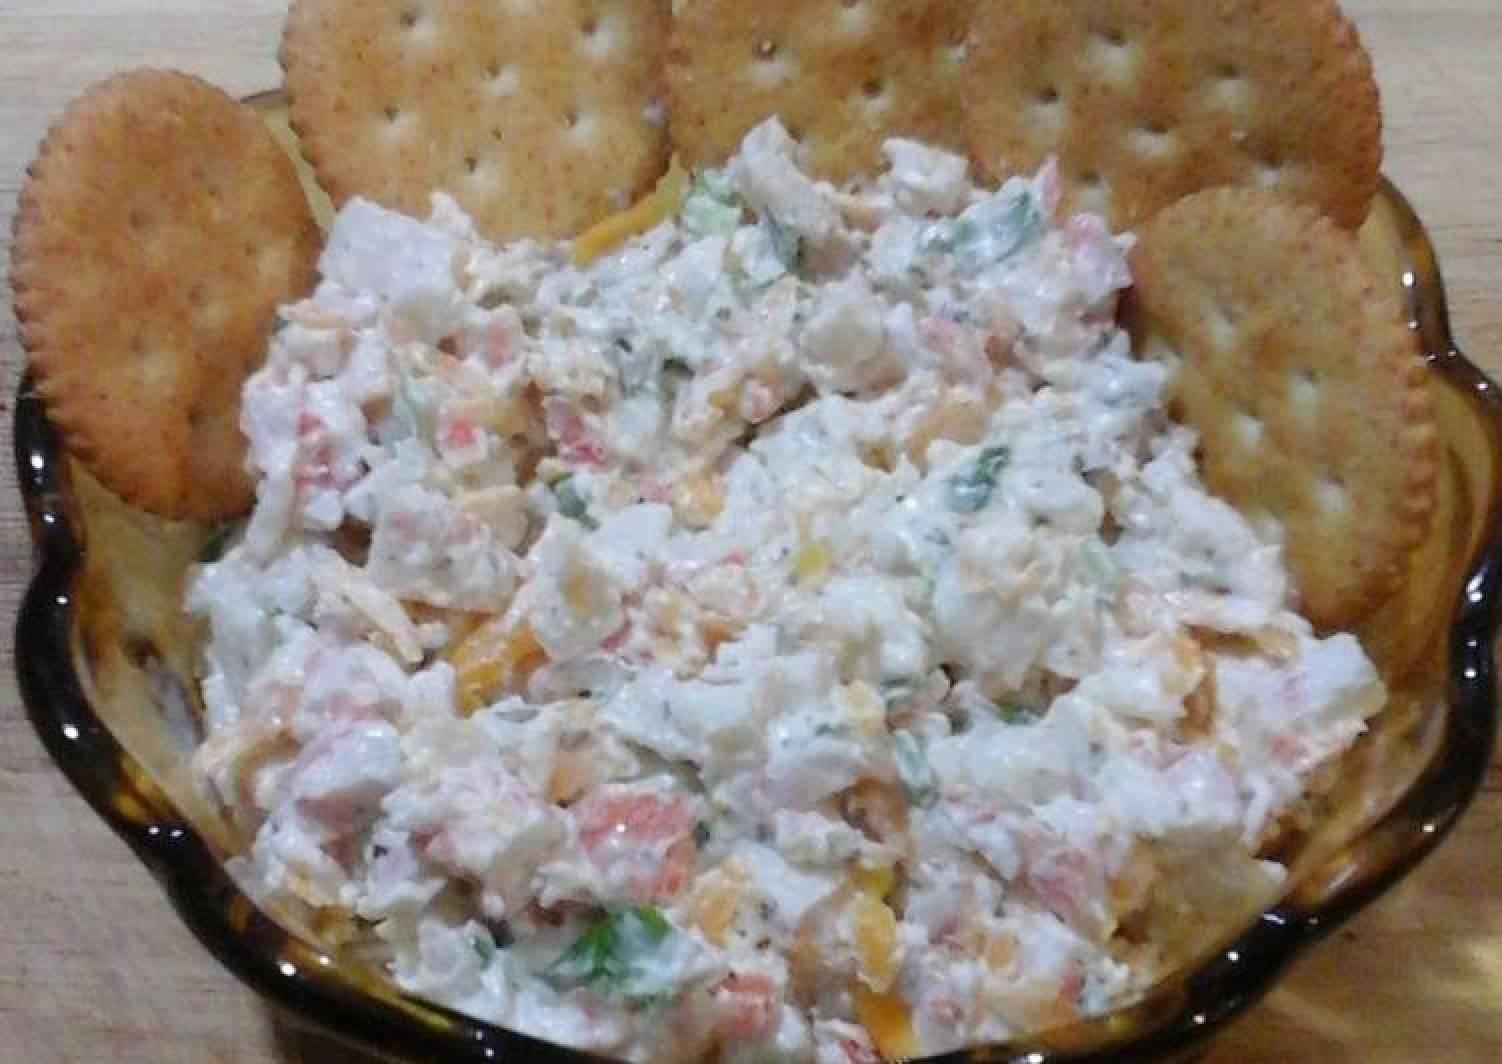 Imitation Crab Salad